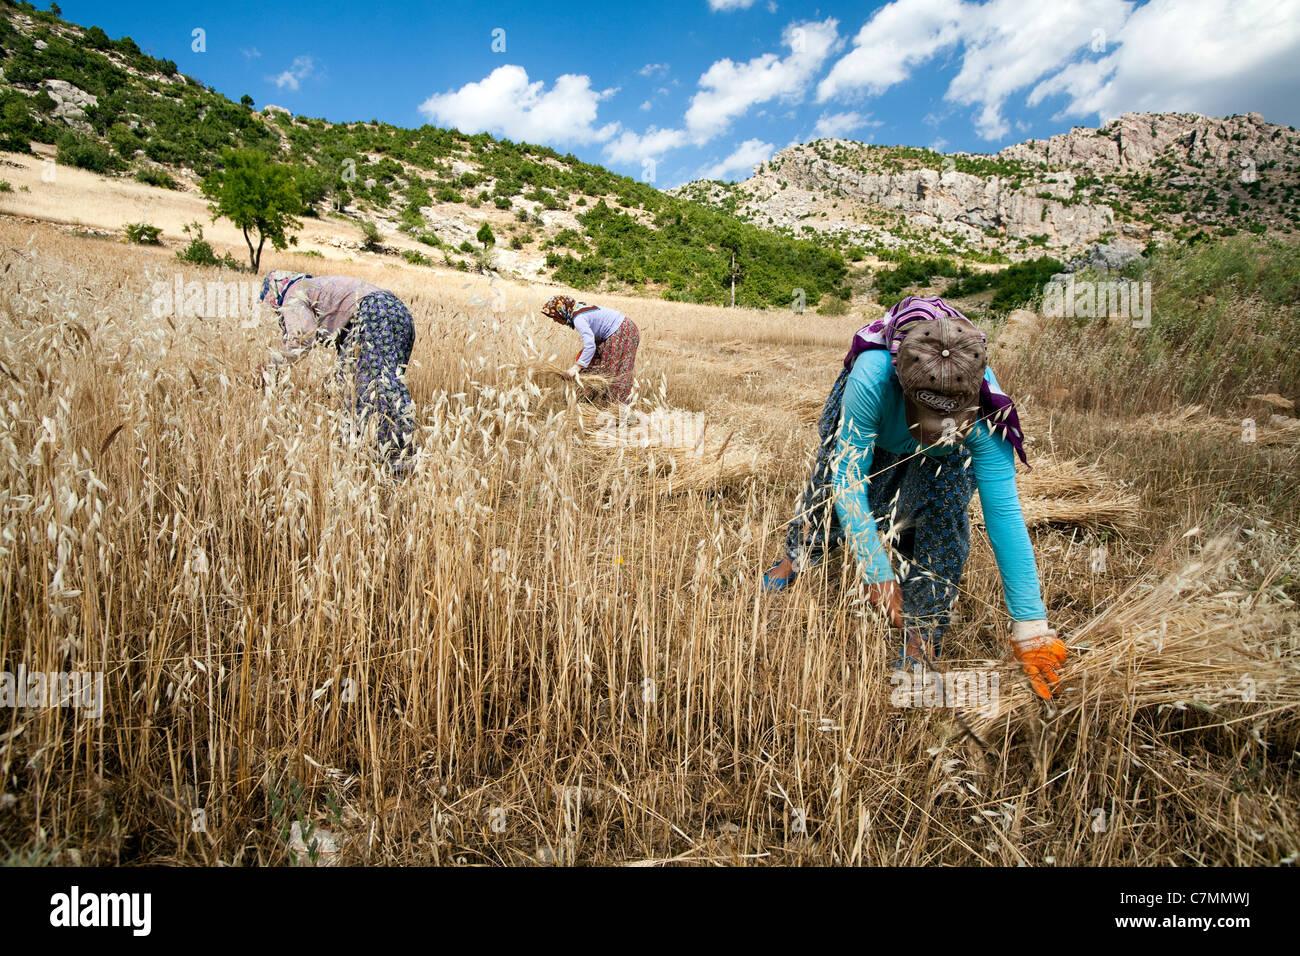 Les femmes la récolte d'orge en Gündoğmuş Antalya Turquie Photo Stock